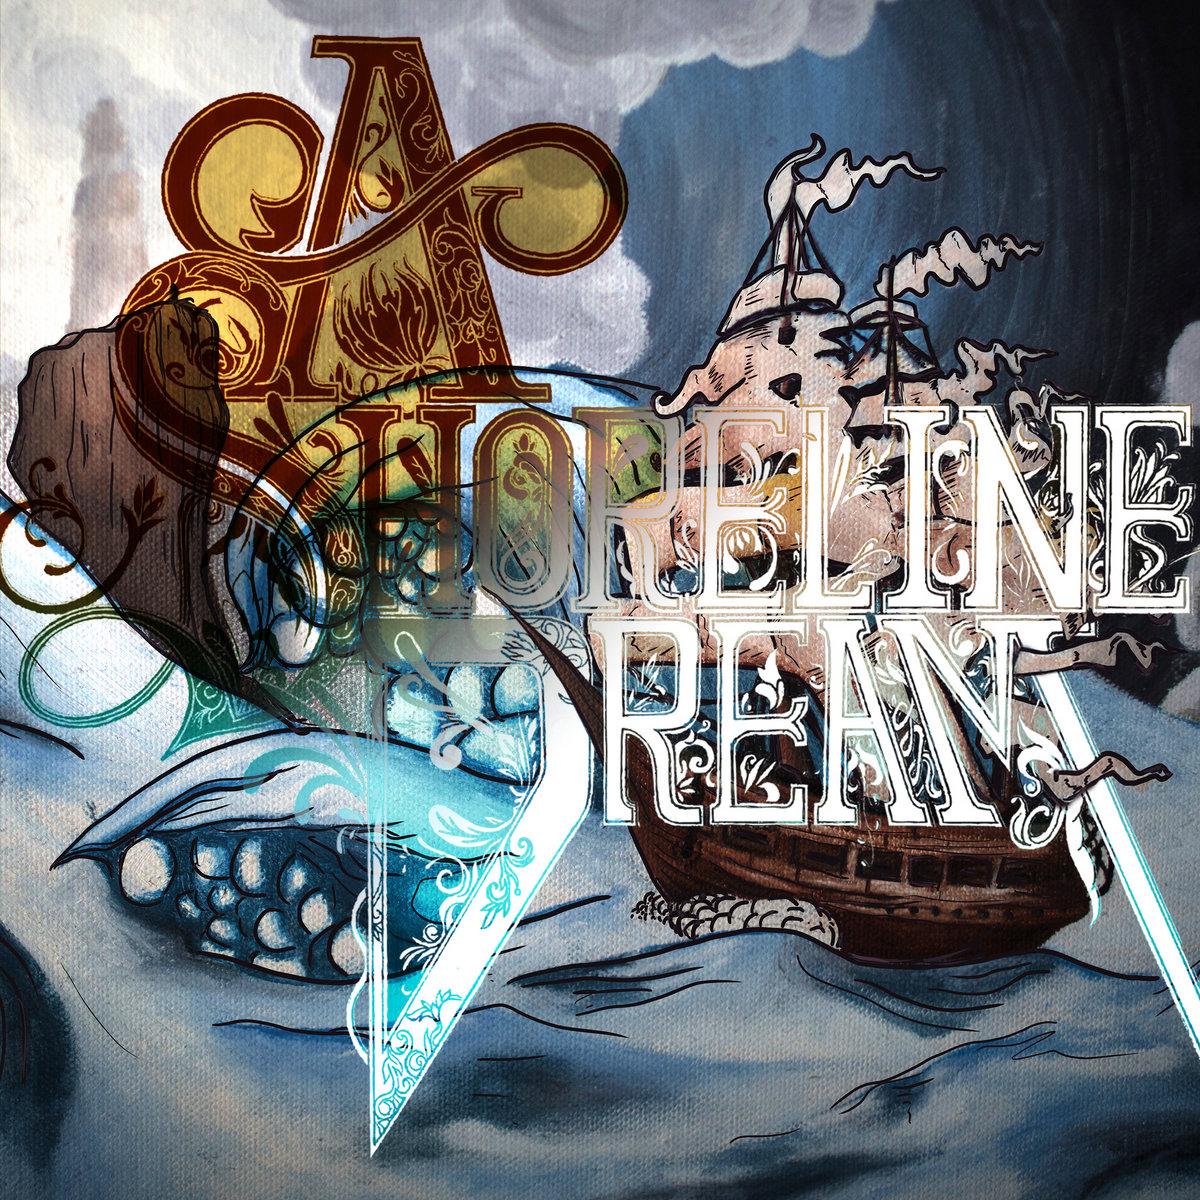 A Shoreline Dream – Meltng LP (cover)